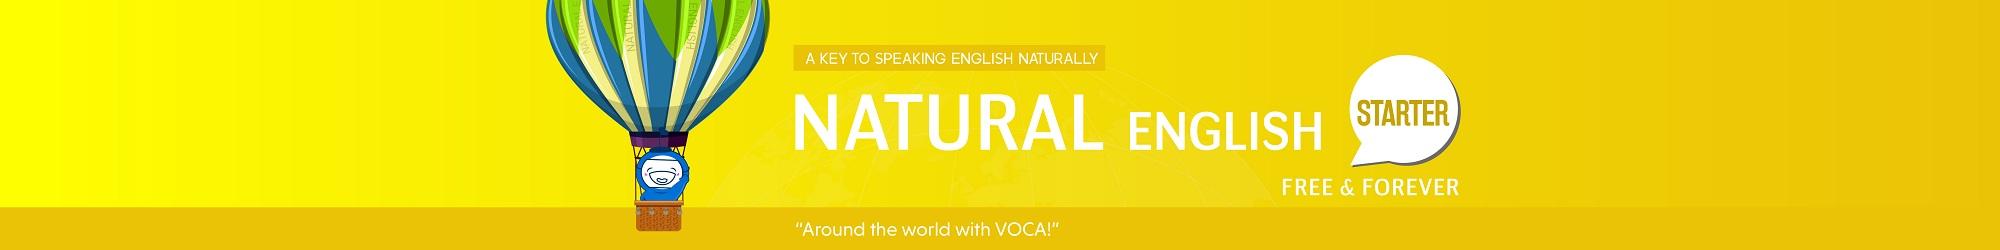 NATURAL ENGLISH (STARTER) banner